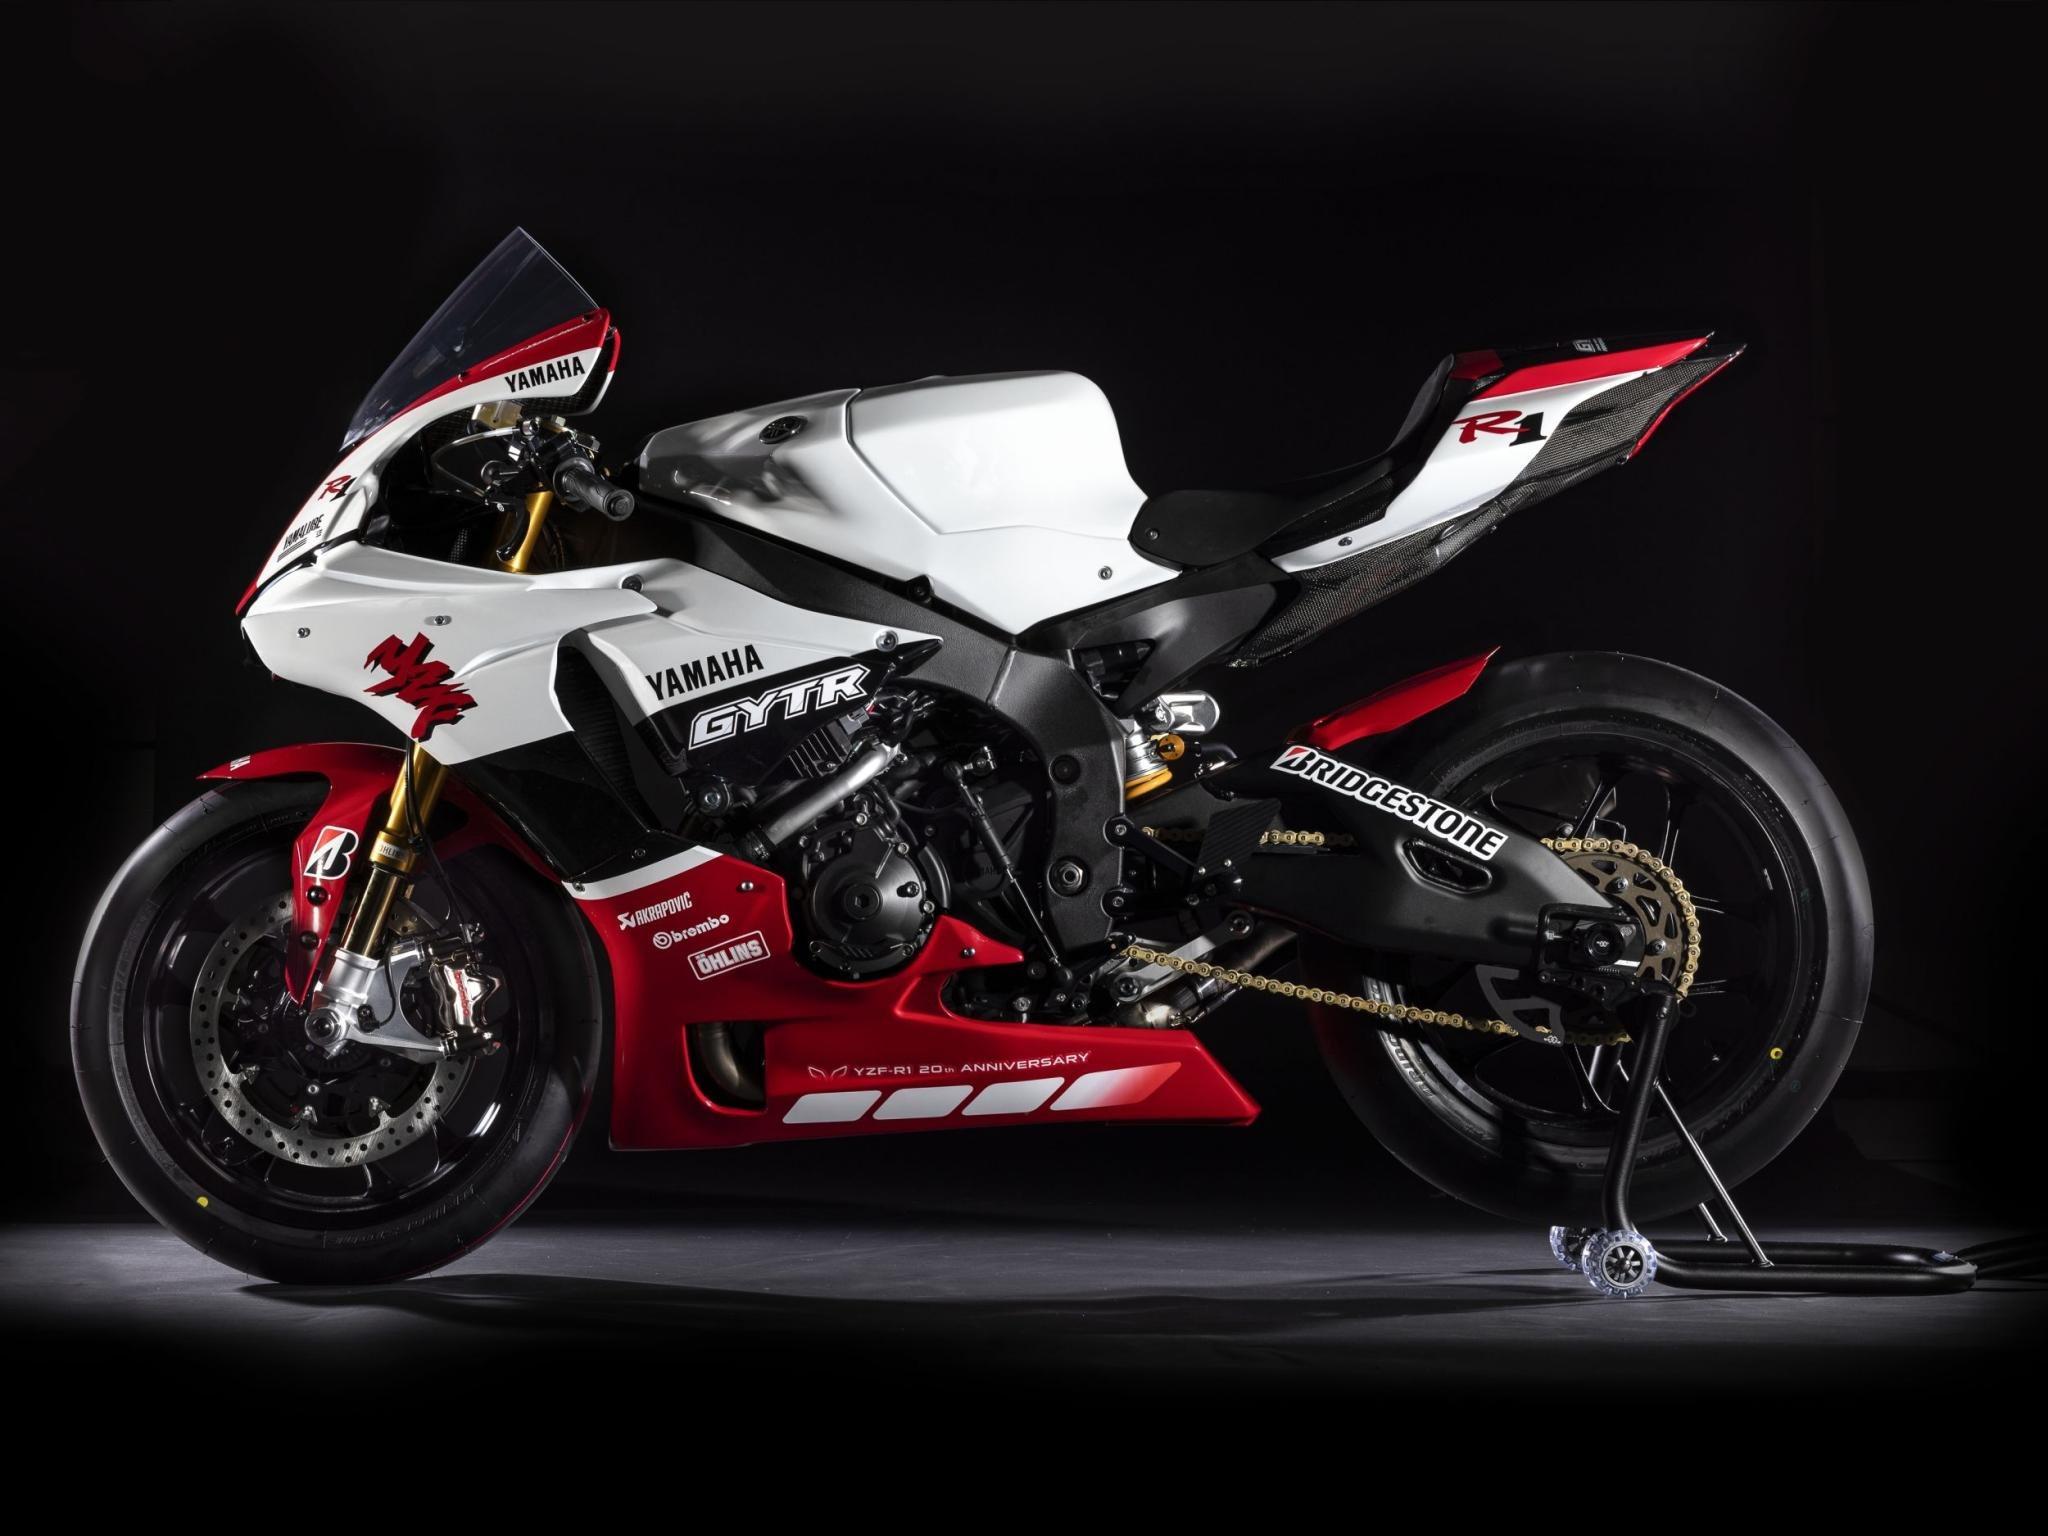 Yamaha Yzf R1 Gytr 2019 Ein Billiges Vergnugen Modellnews